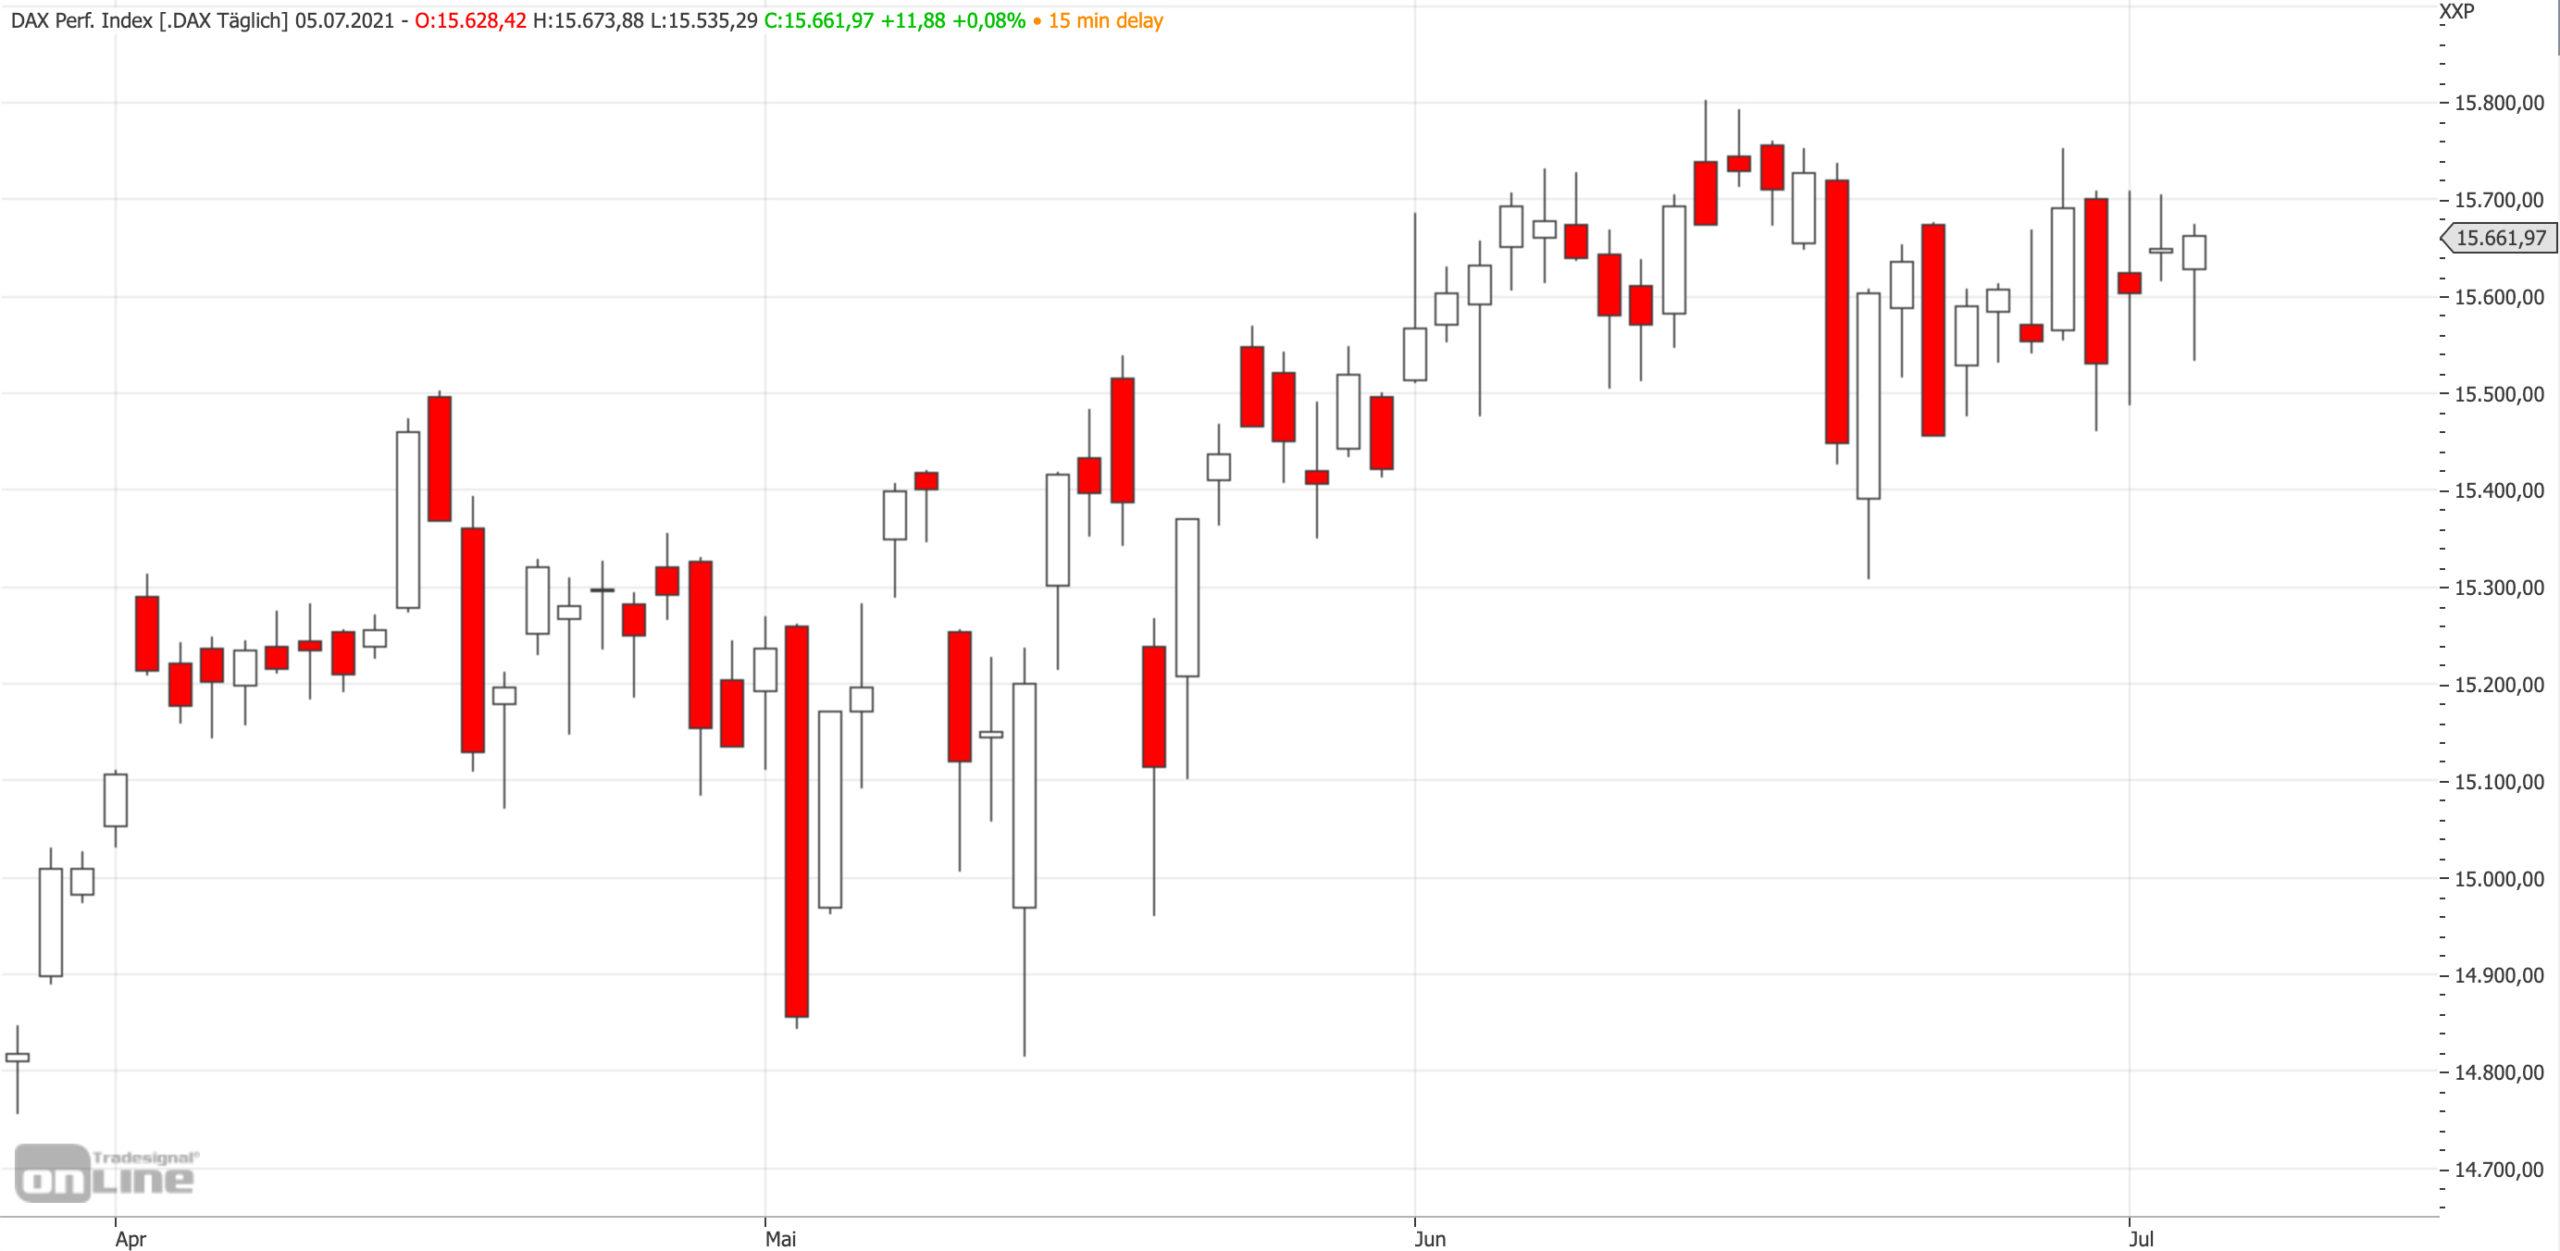 Mittelfristiger DAX-Chart am 05.07.2021